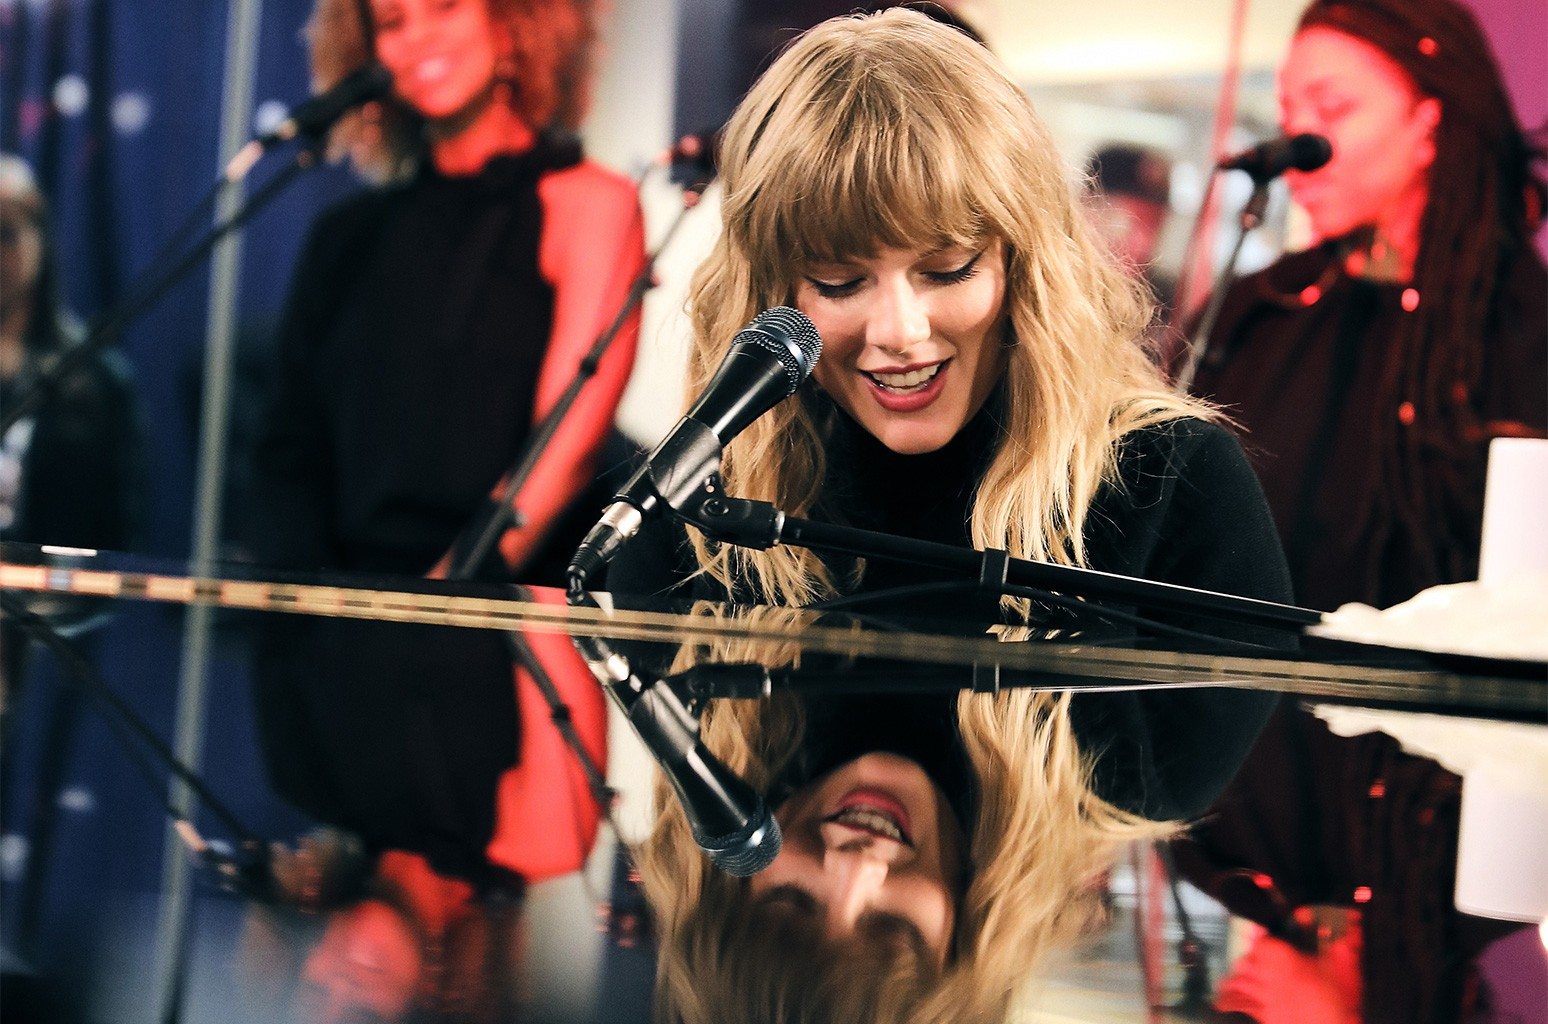 Taylor Swift performed on SiriusXM